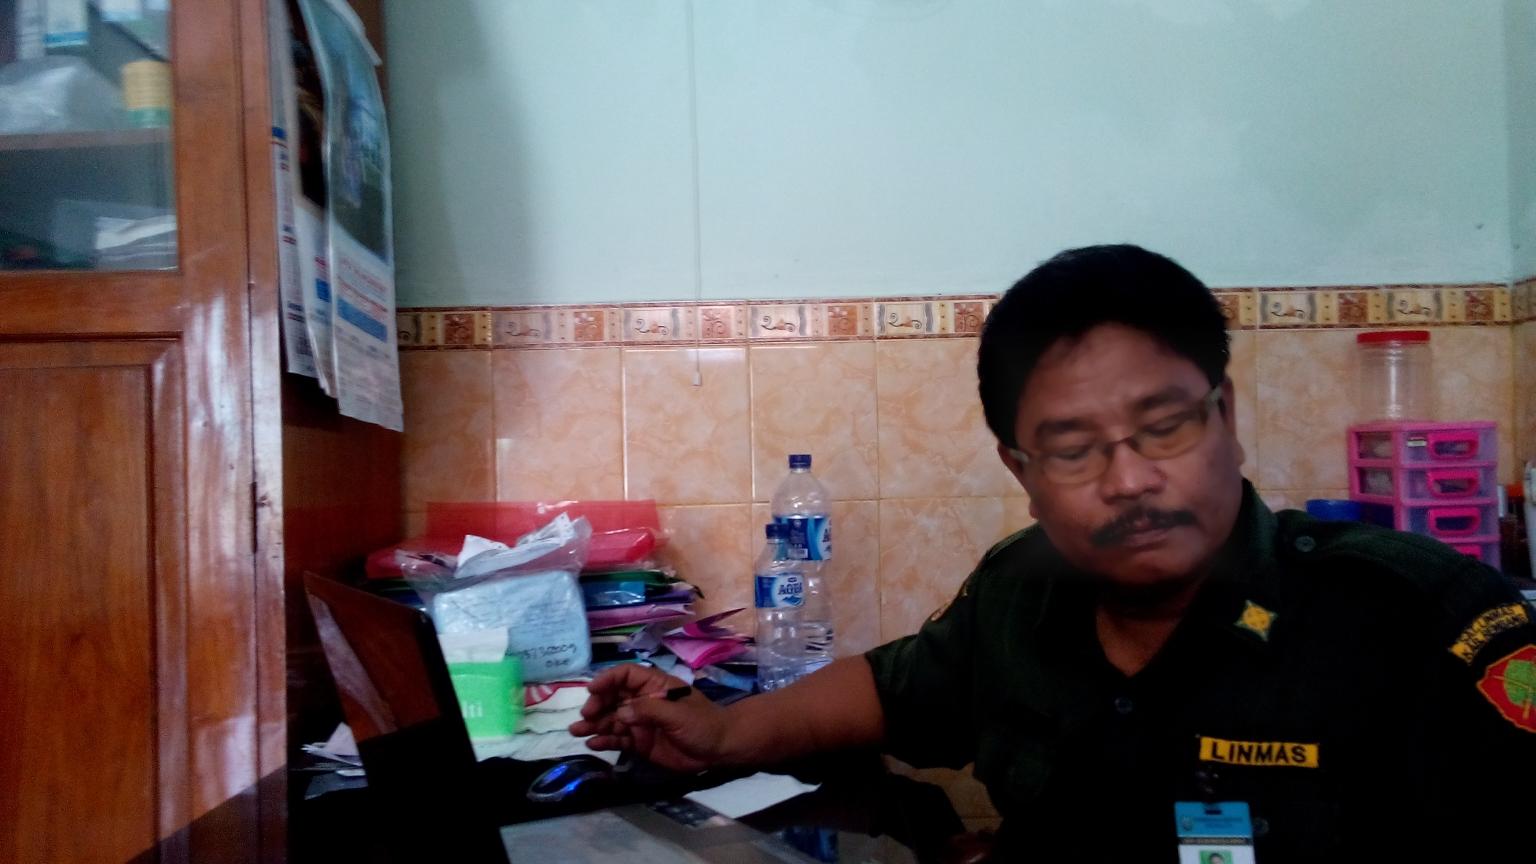 Plt Kepala Kantor Kesbangpolinmas Rembang Romli. (Foto: Pujianto)